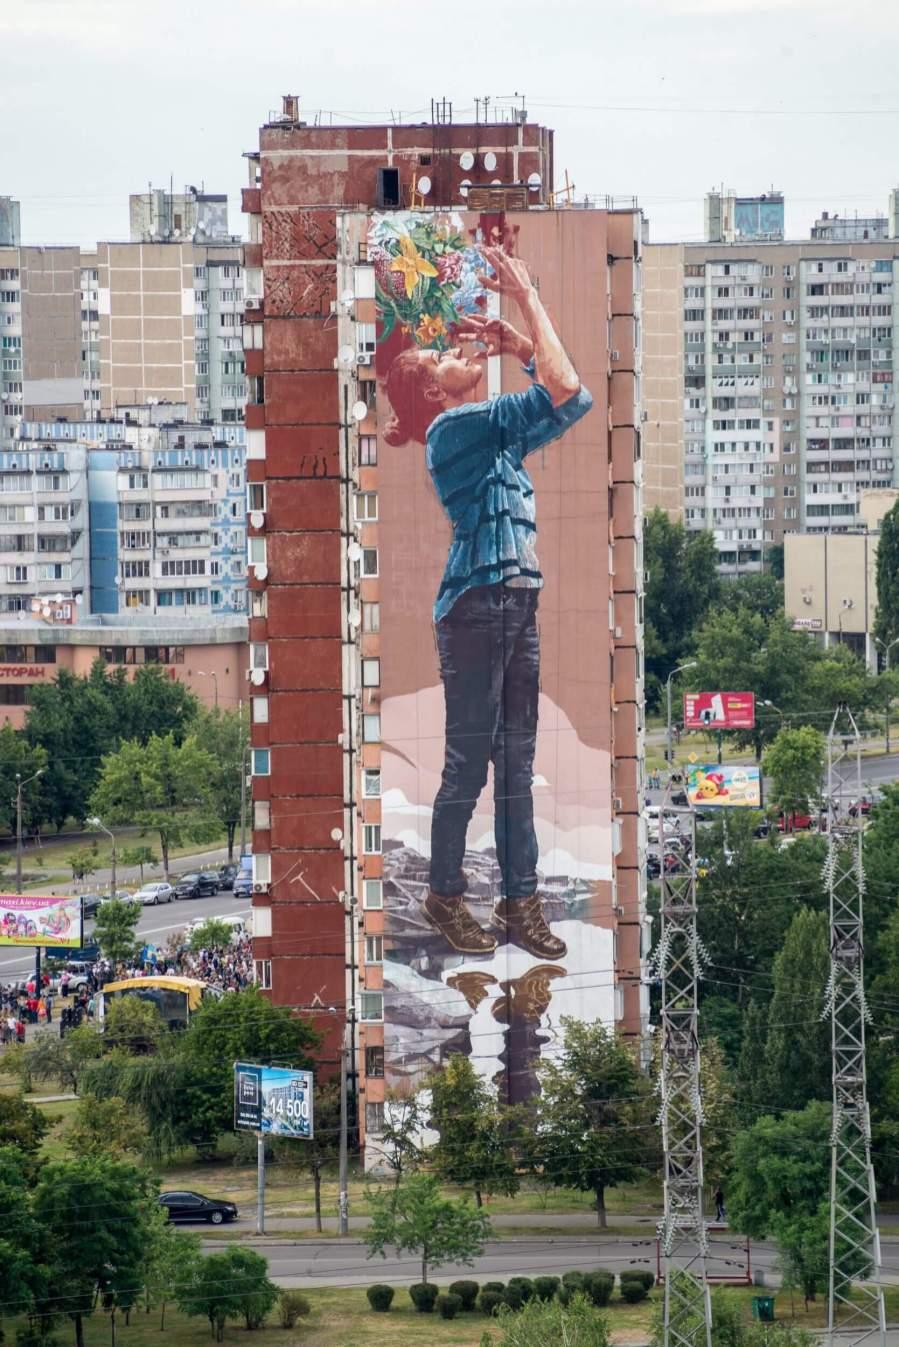 Fstreet art kiev mural social club ukraine intan3